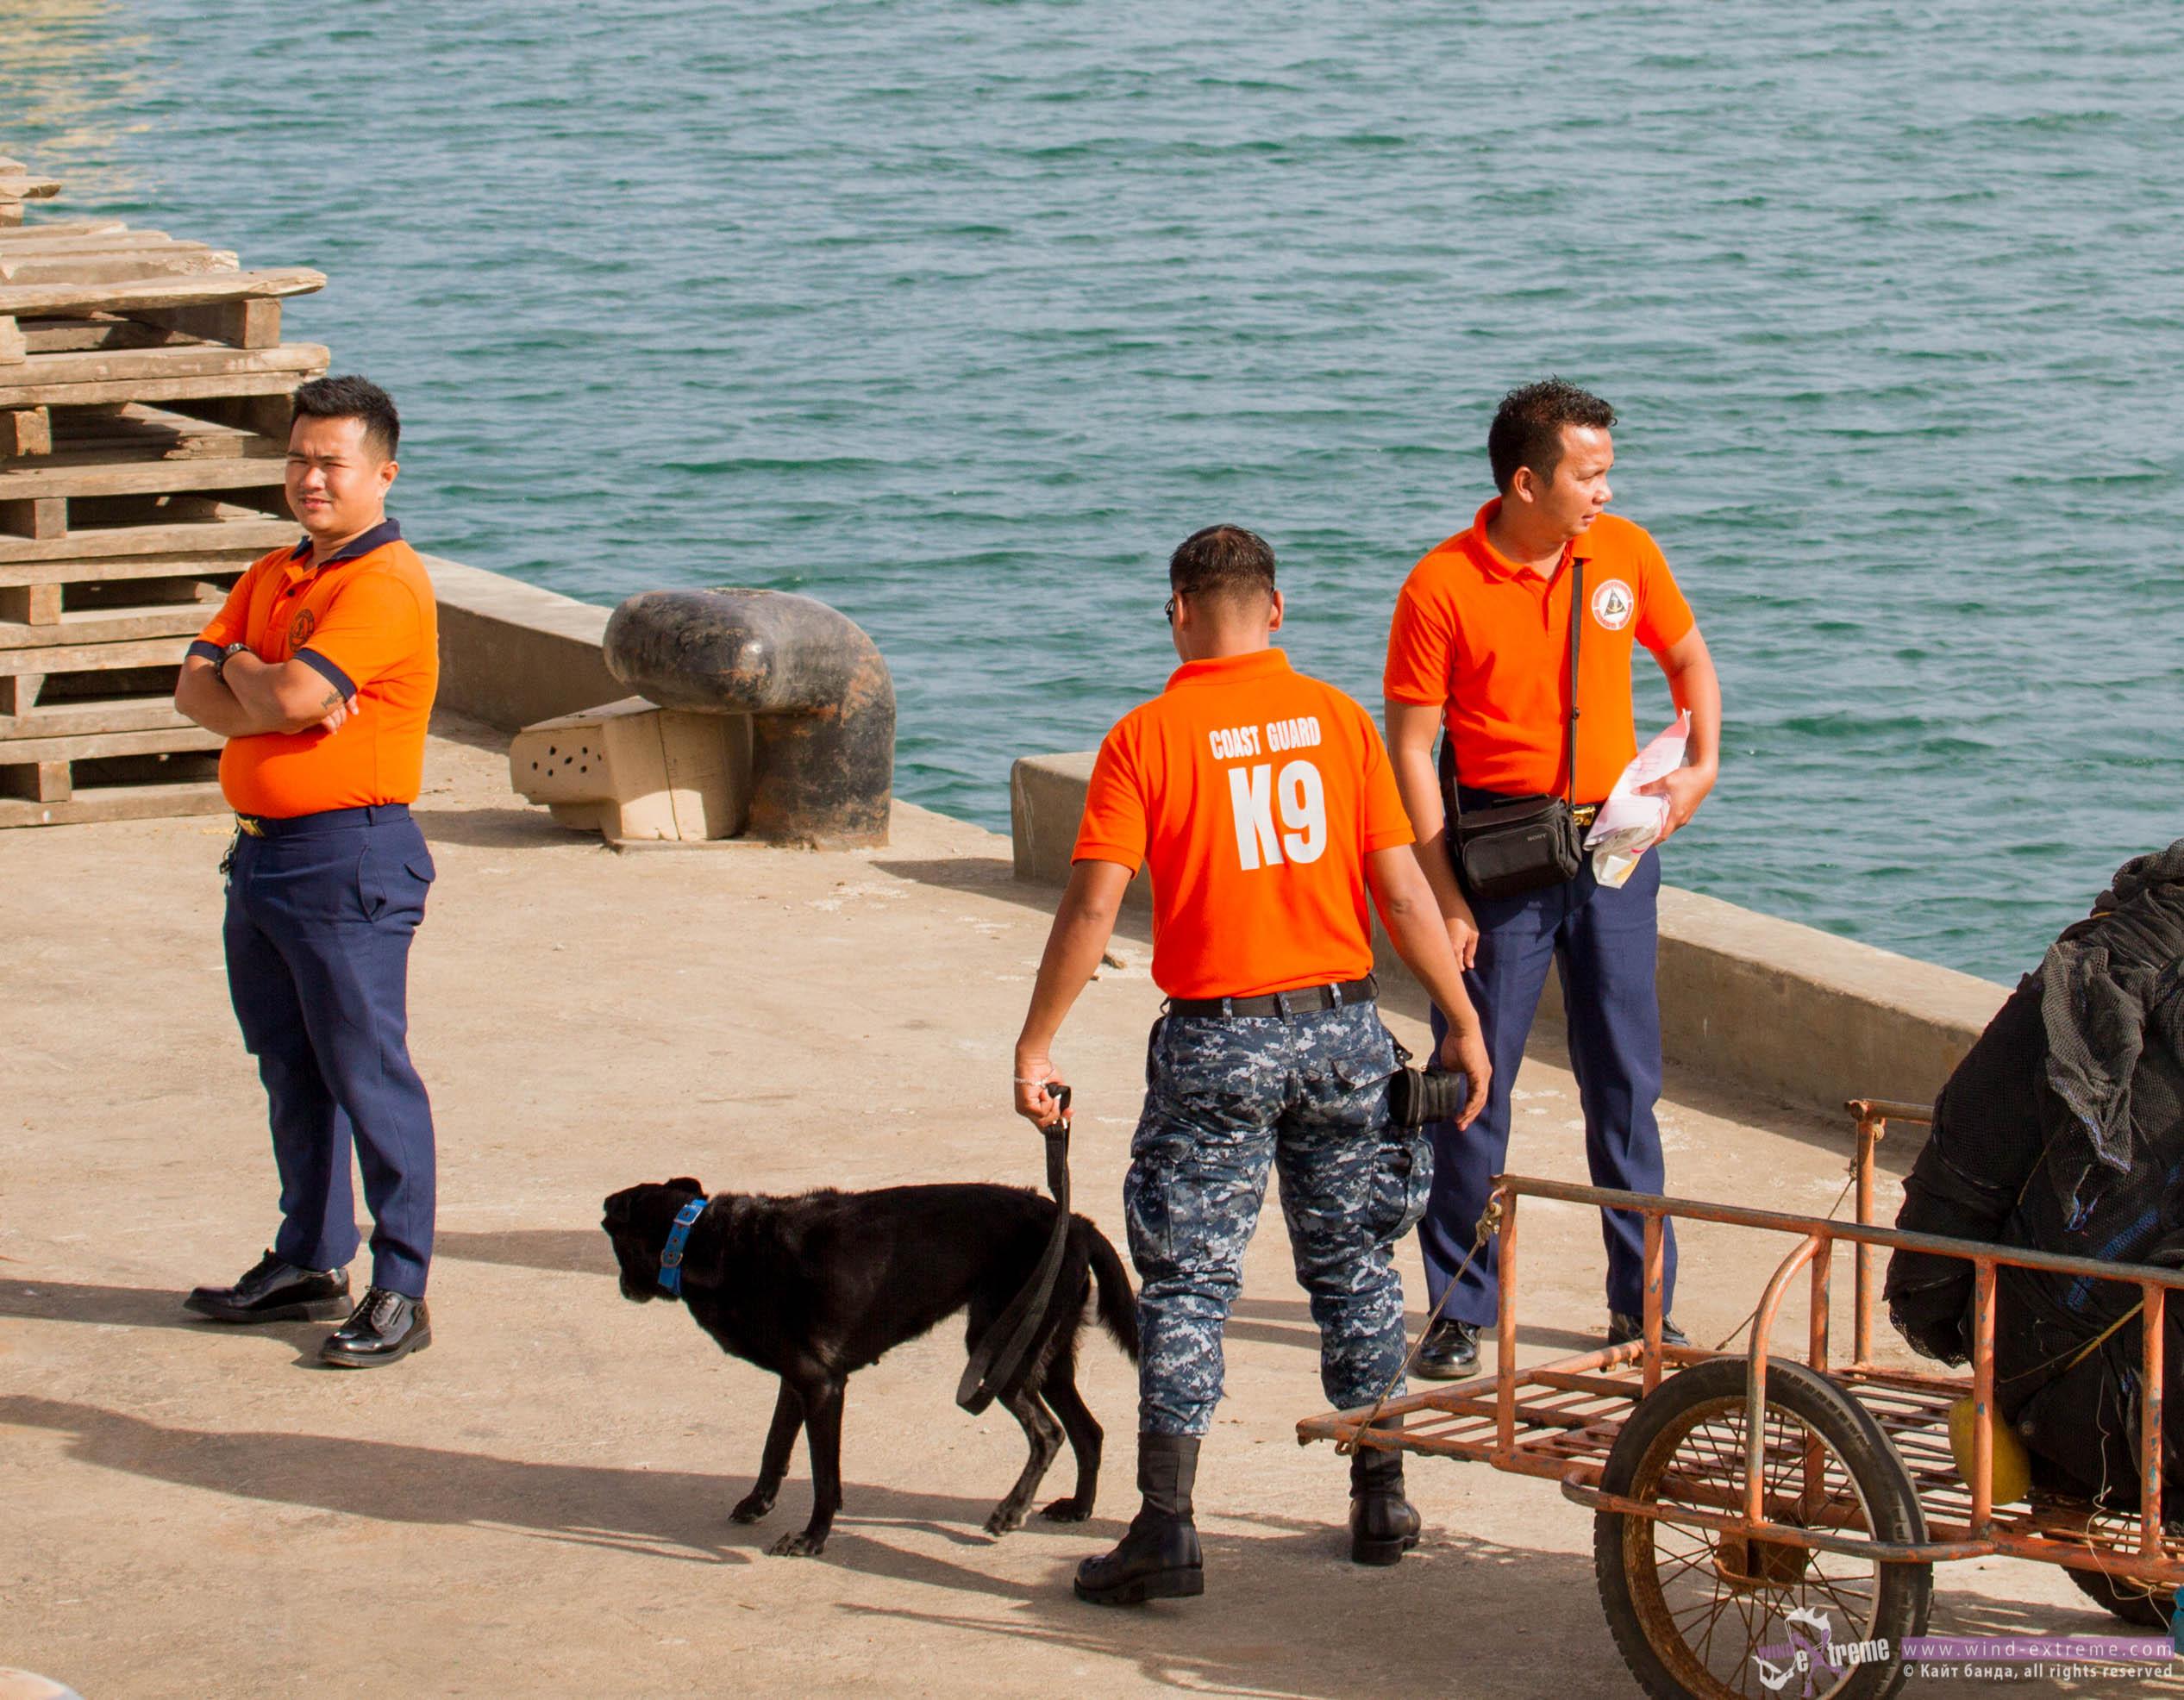 Досмотр парома на остров Куйо собаками К9, кайт школа Wind-Extreme